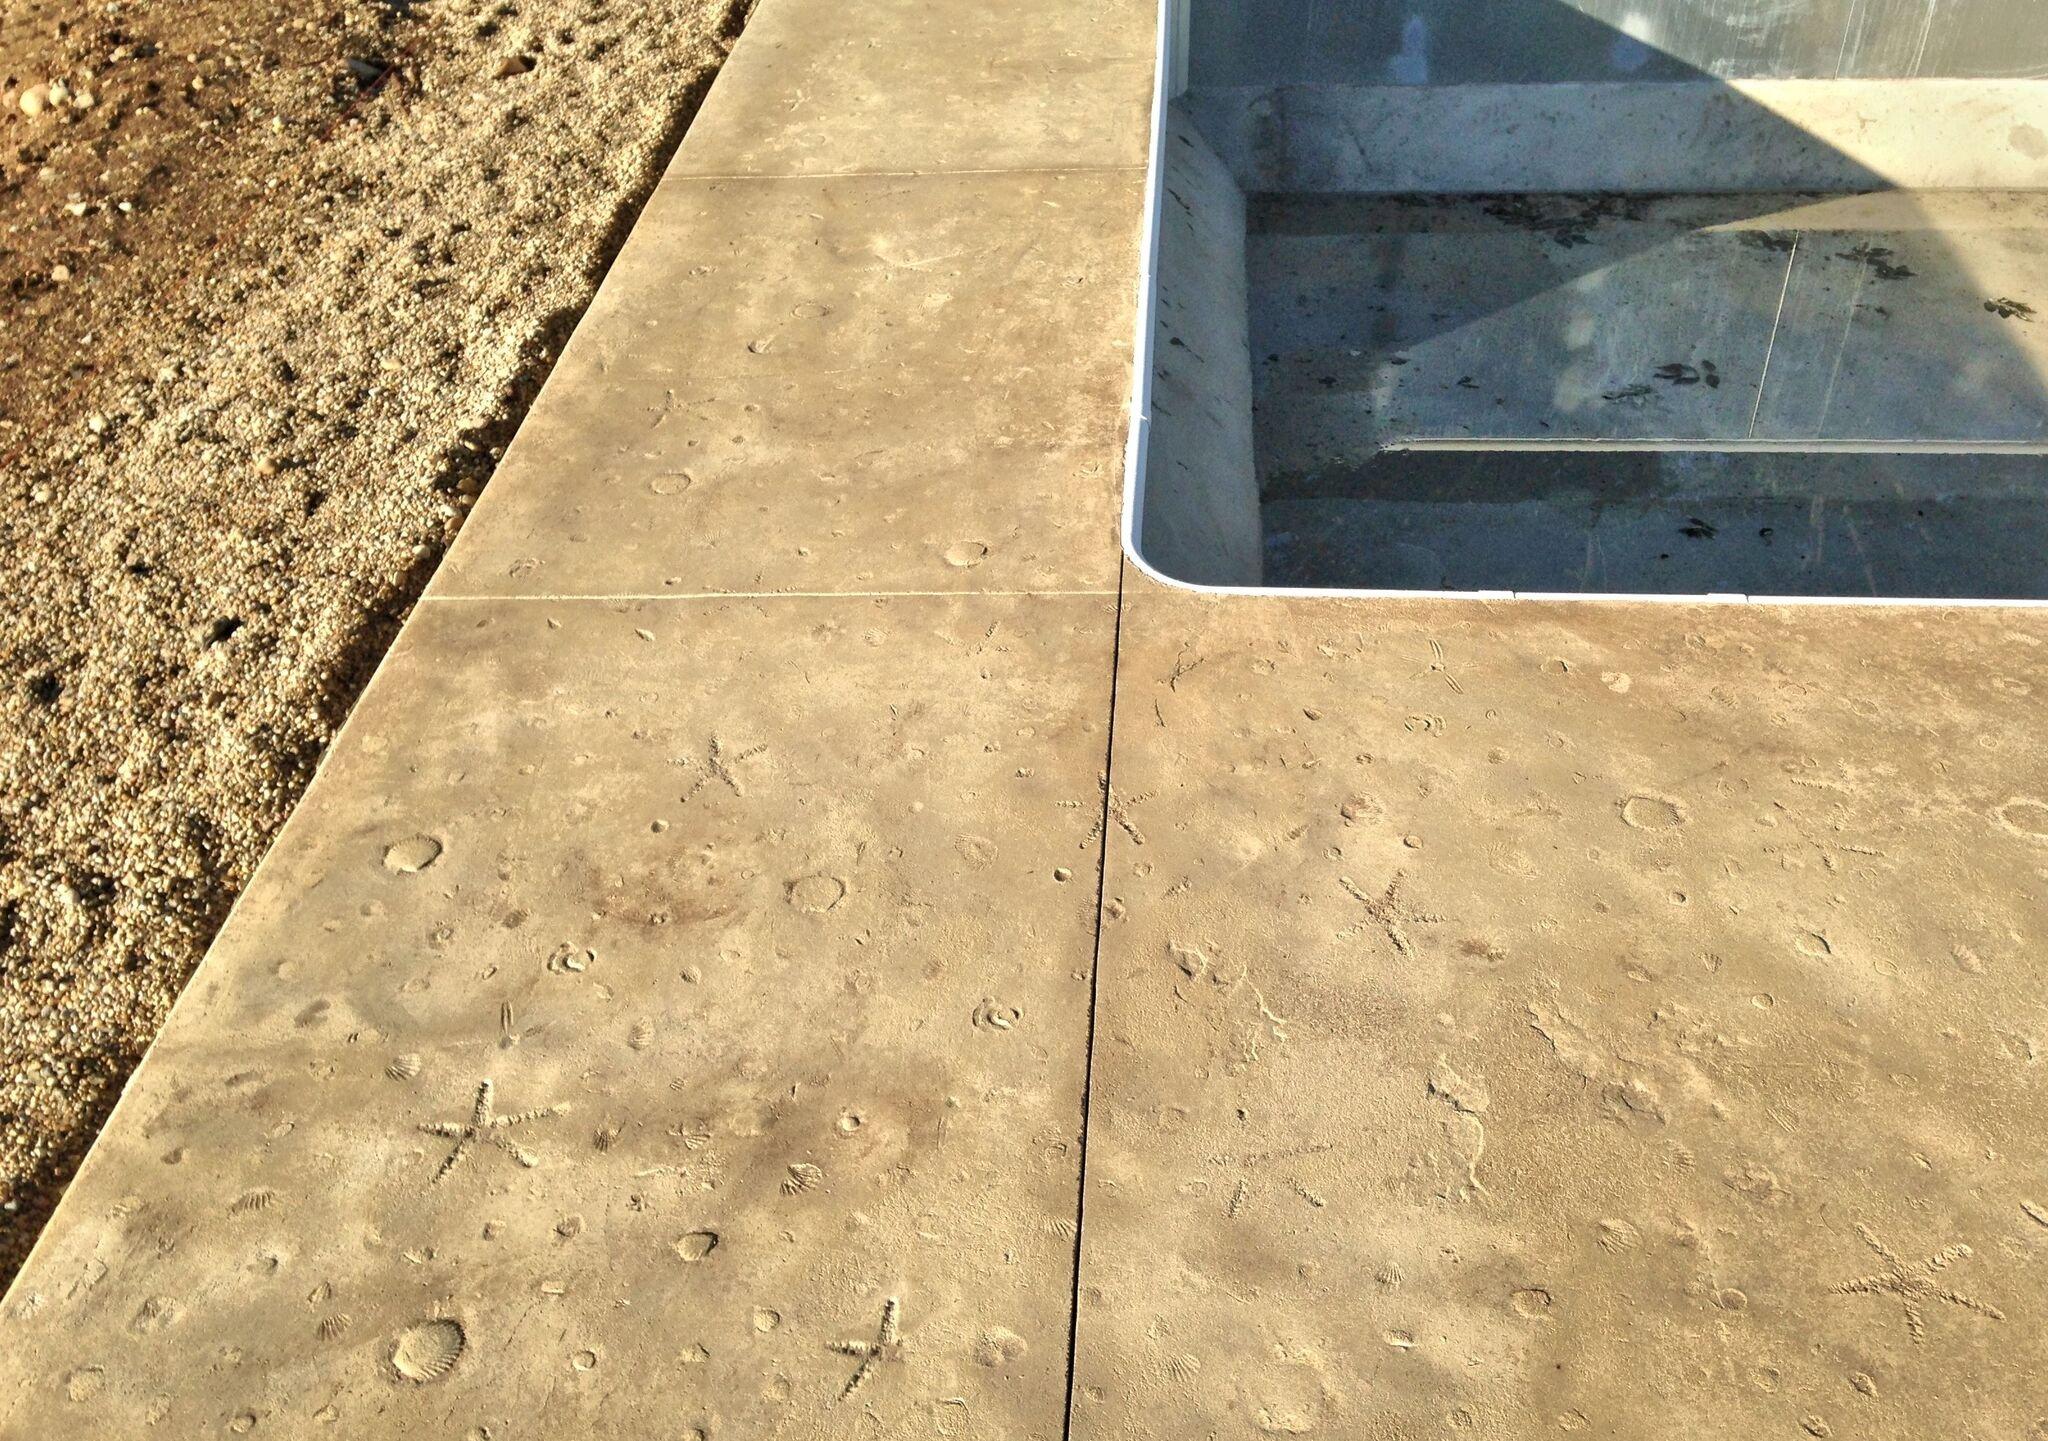 Seascape Ocean Floor Single (3 x 3 ft) Concrete Stamp Mat Seamless Skin